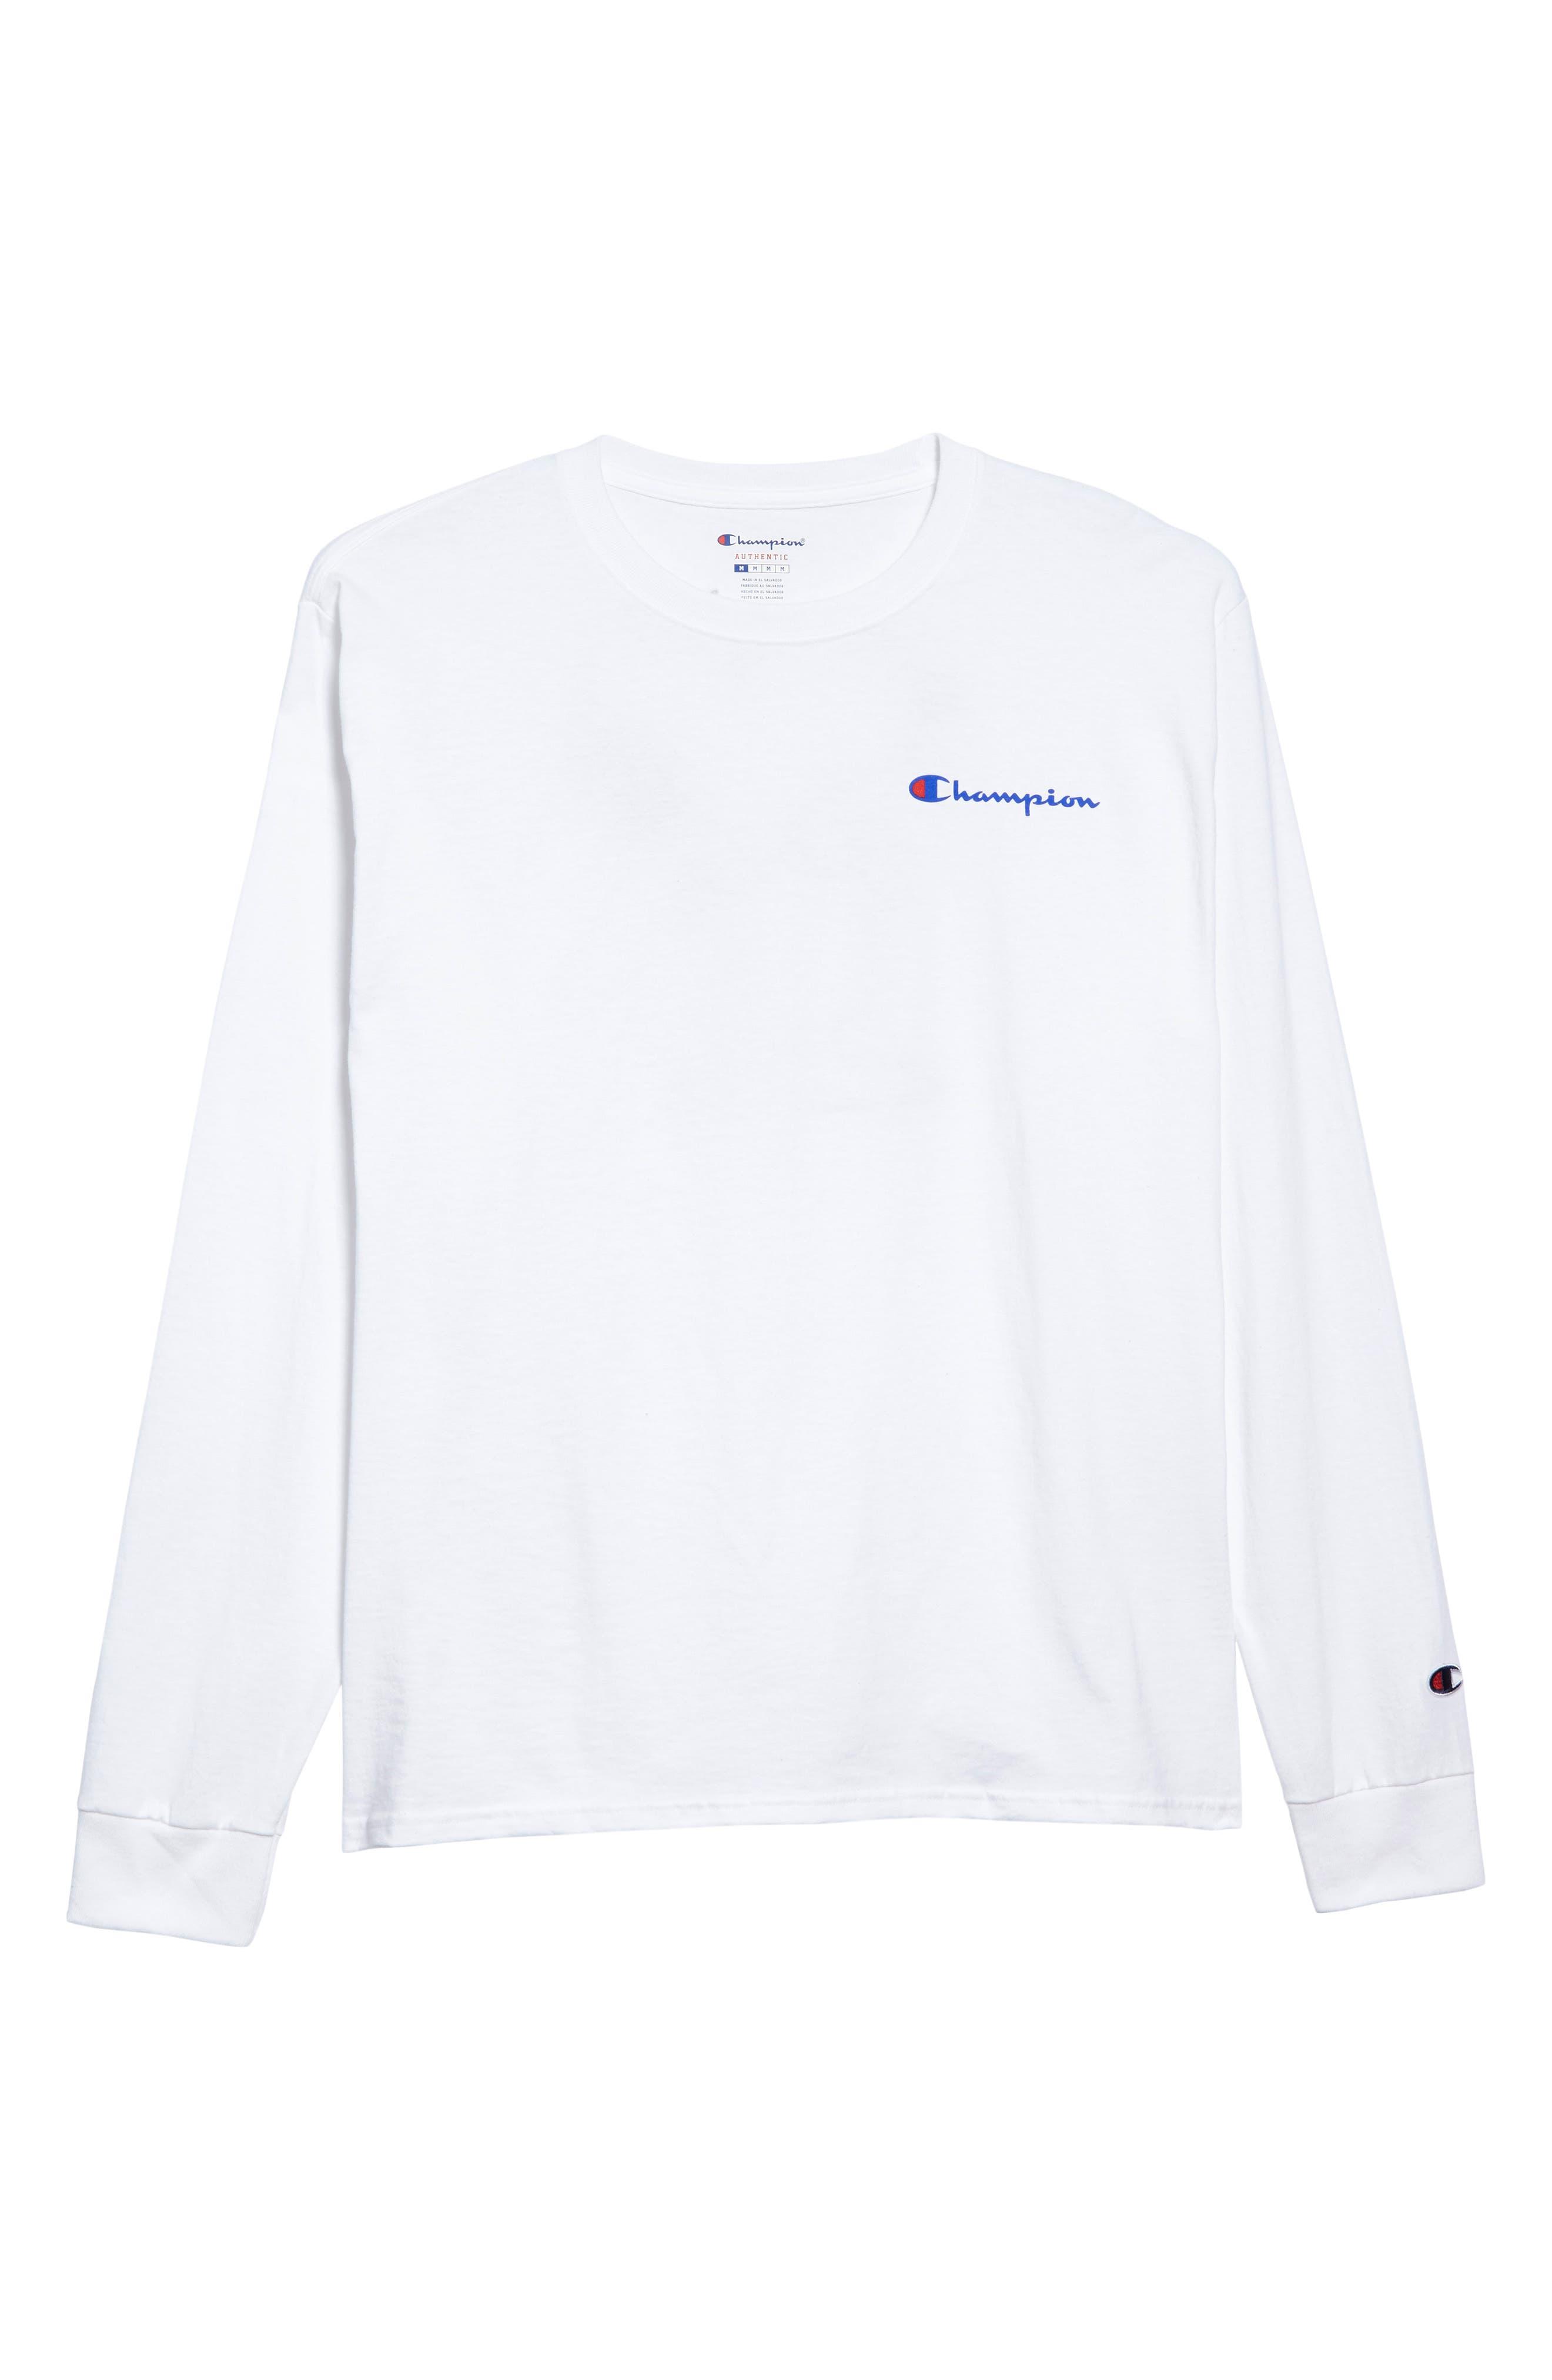 Snoopy Unisex Long Sleeve T-Shirt,                             Alternate thumbnail 6, color,                             100